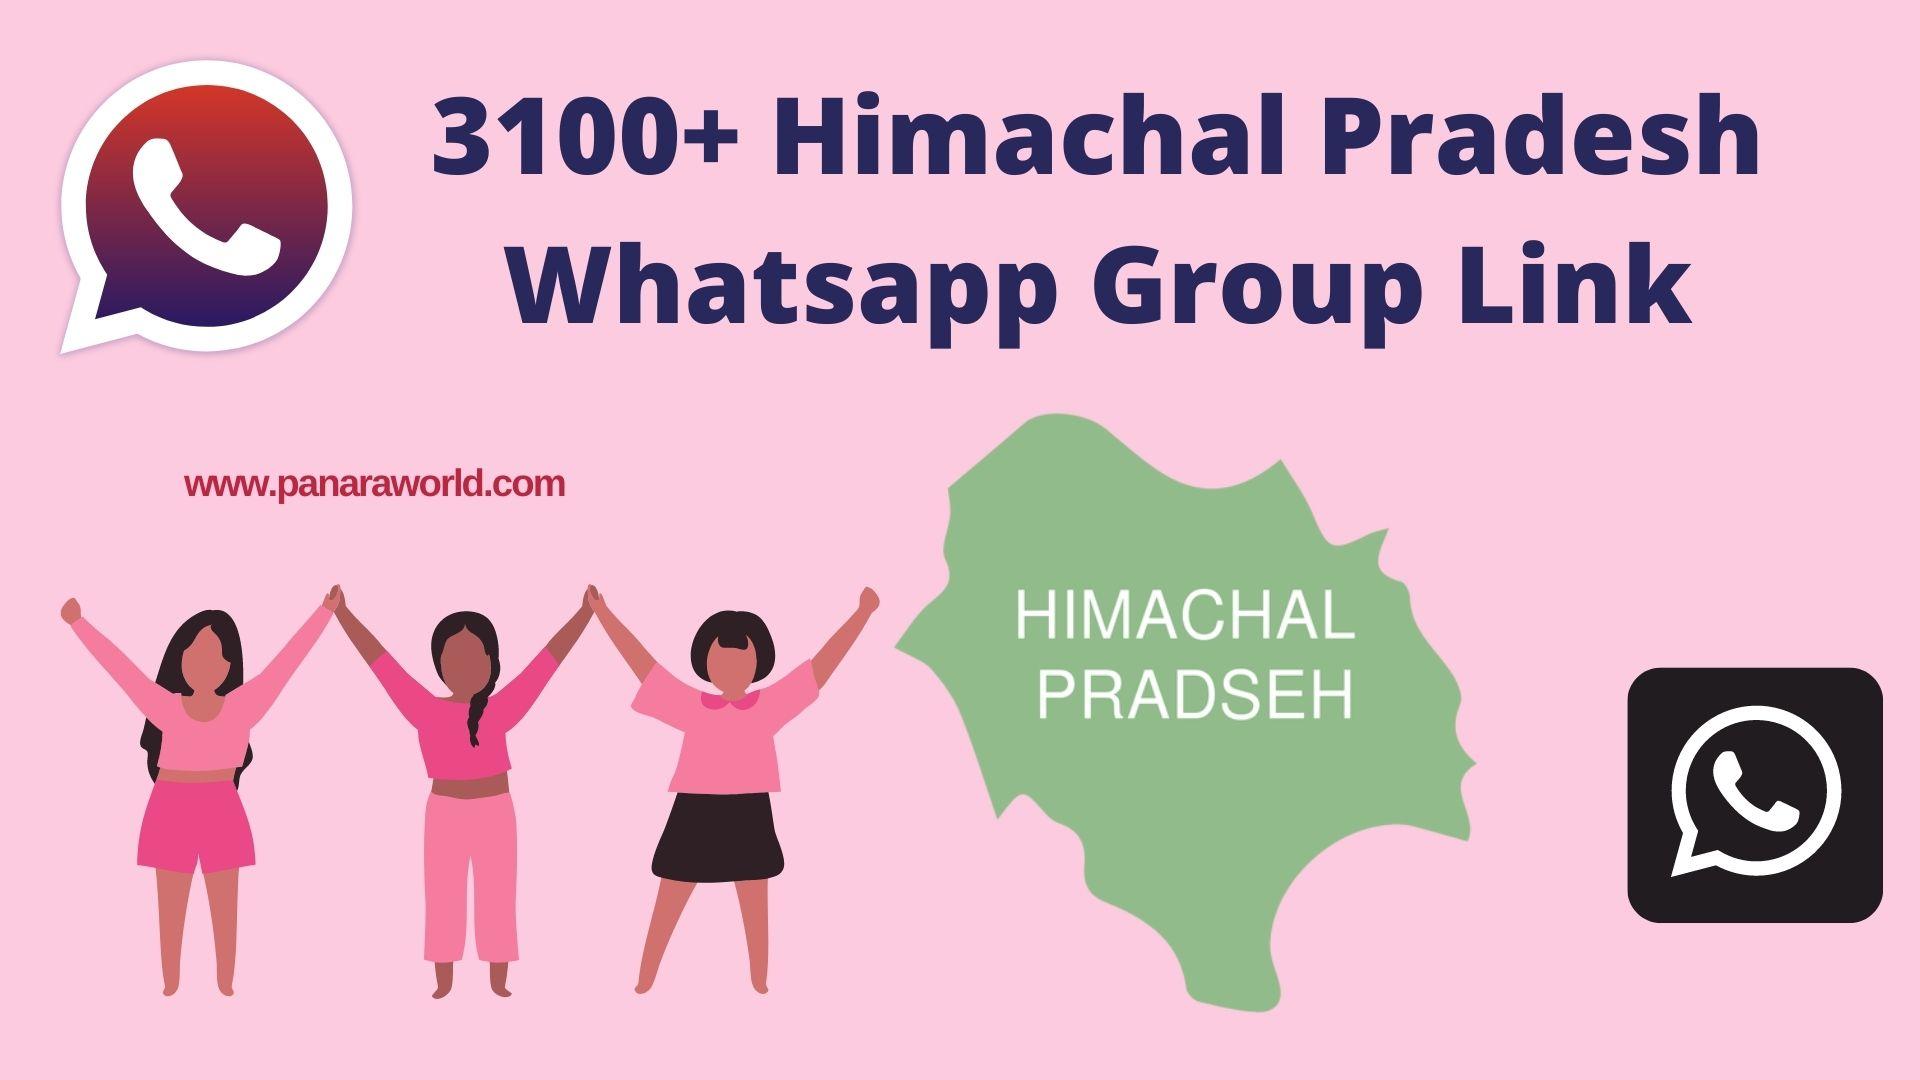 Himachal Pradesh Whatsapp Group Link